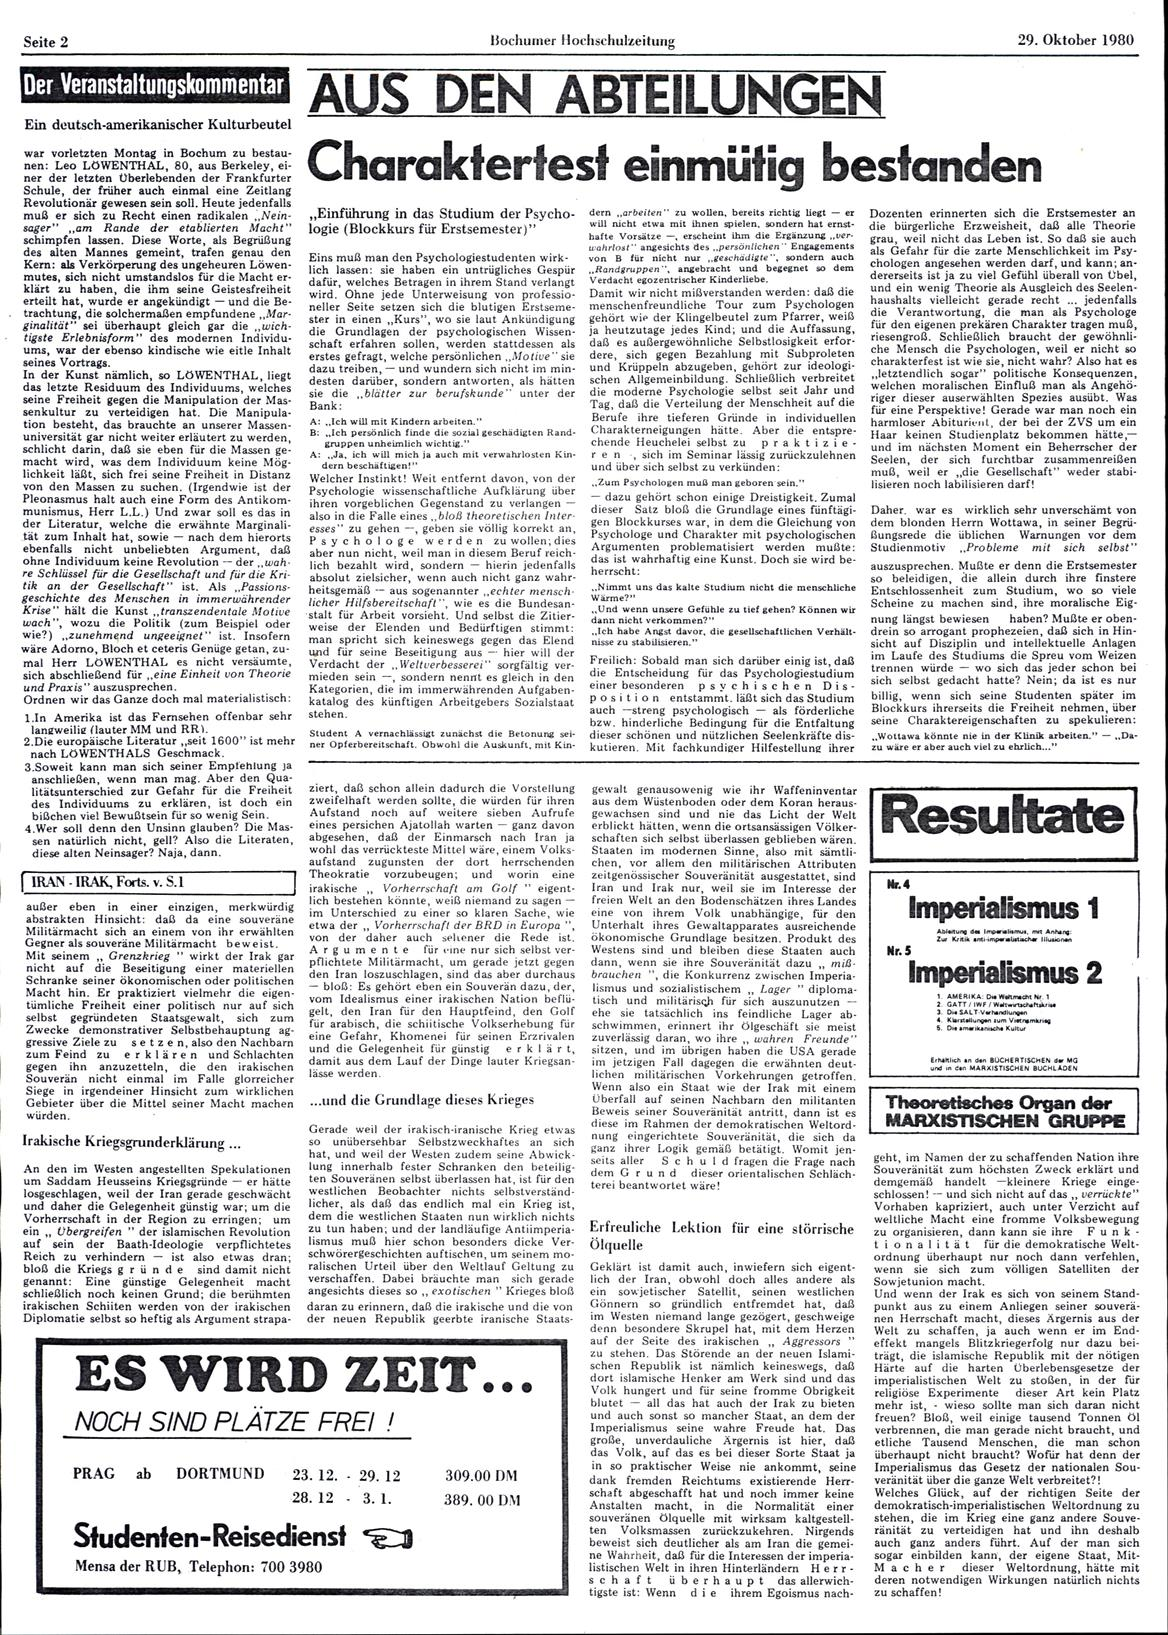 Bochum_BHZ_19801029_019_002